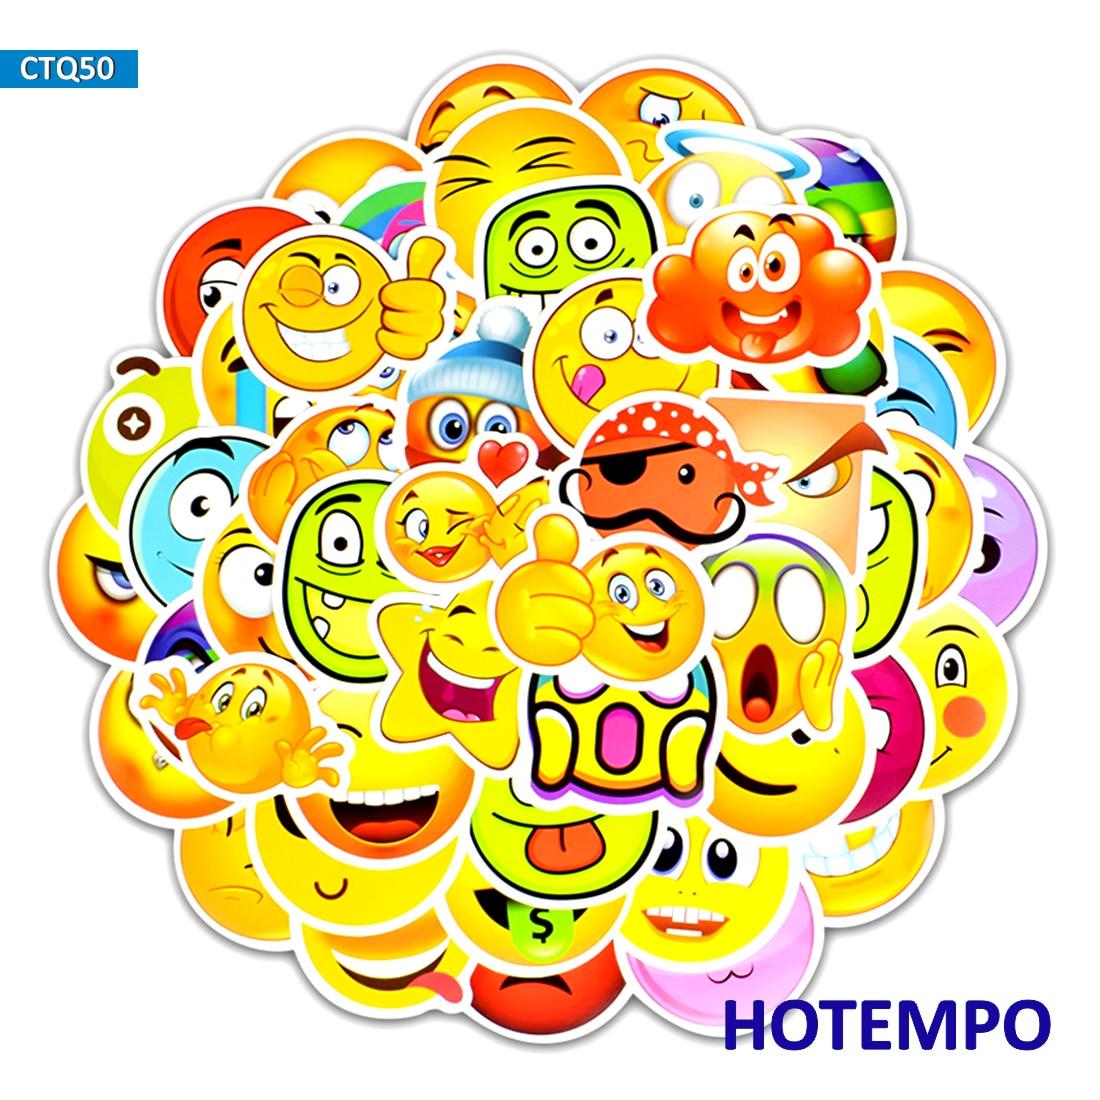 50pcs Funny Emoticon Smile Face Decor Emoji Stickers For For